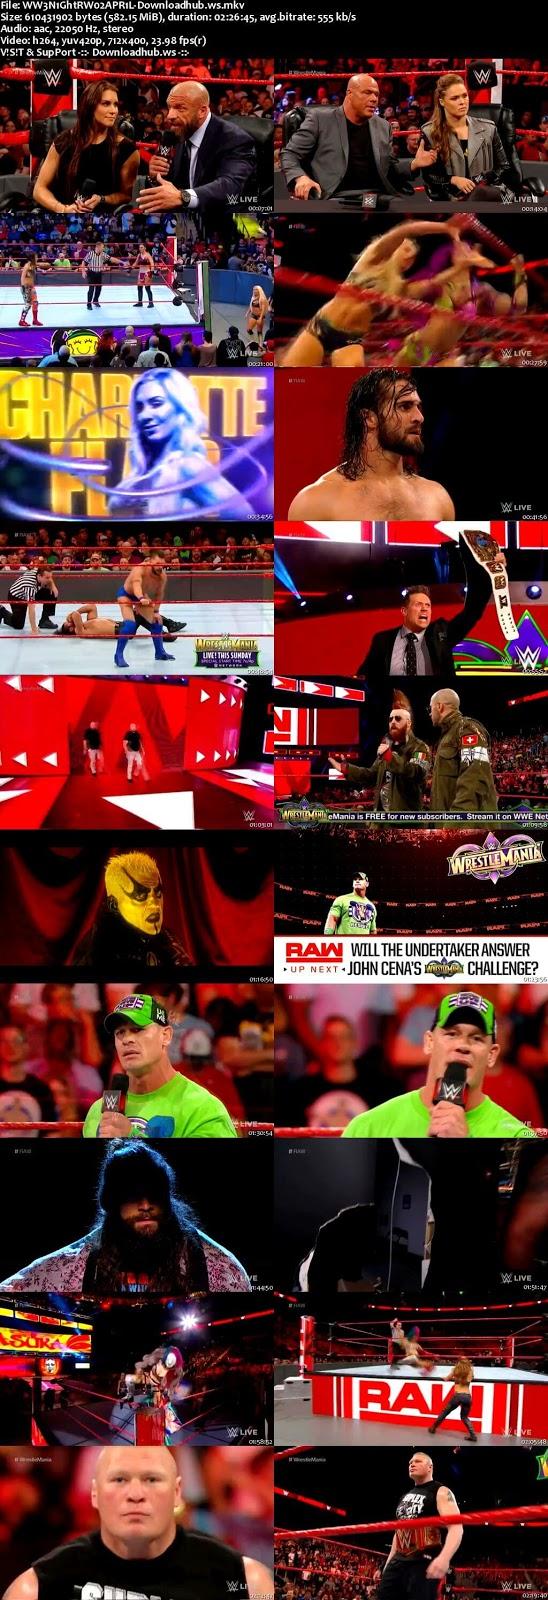 WWE Monday Night Raw 02 April 2018 480p HDTV Download